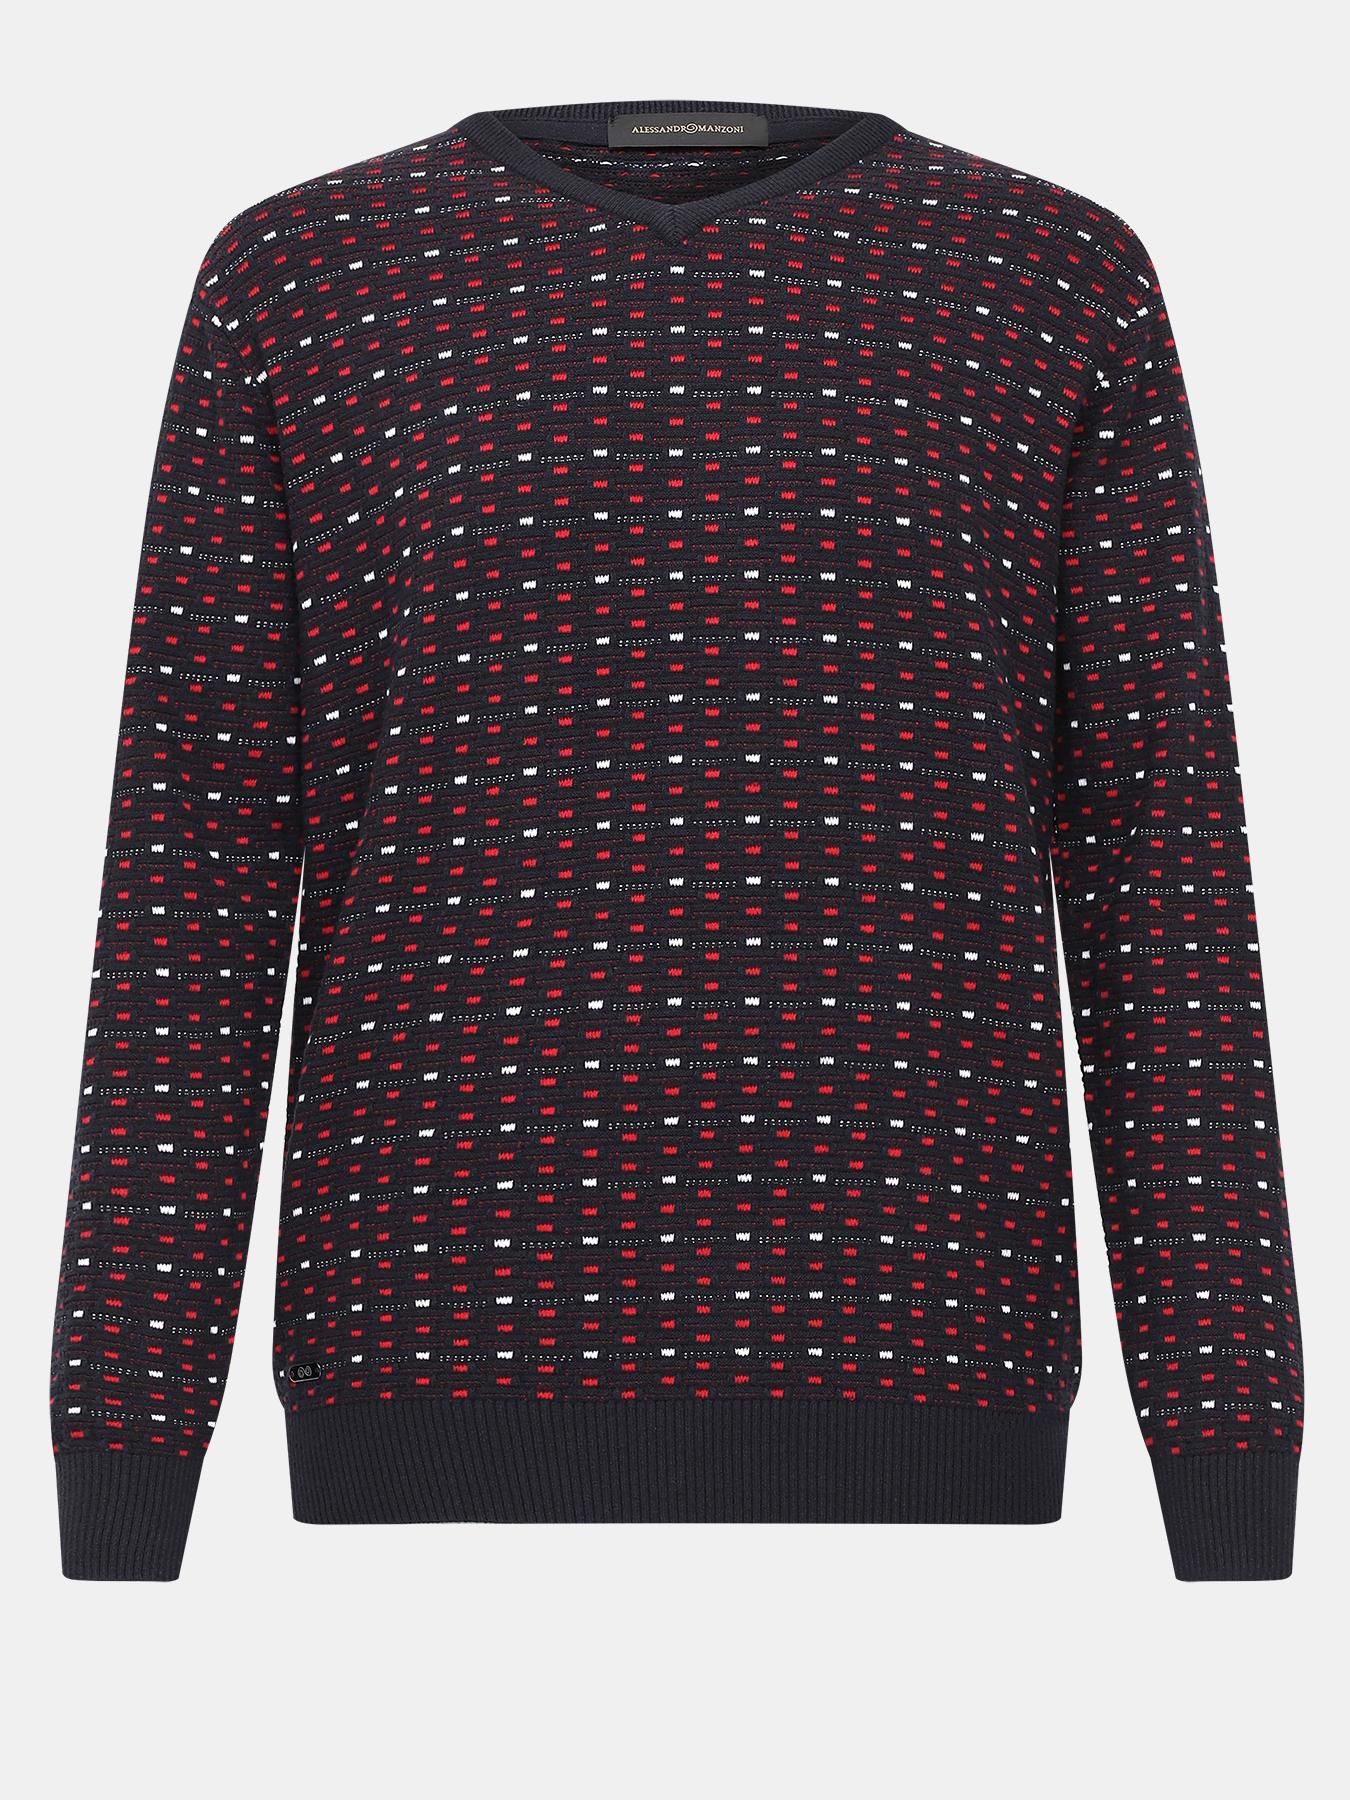 Пуловеры Alessandro Manzoni Пуловер